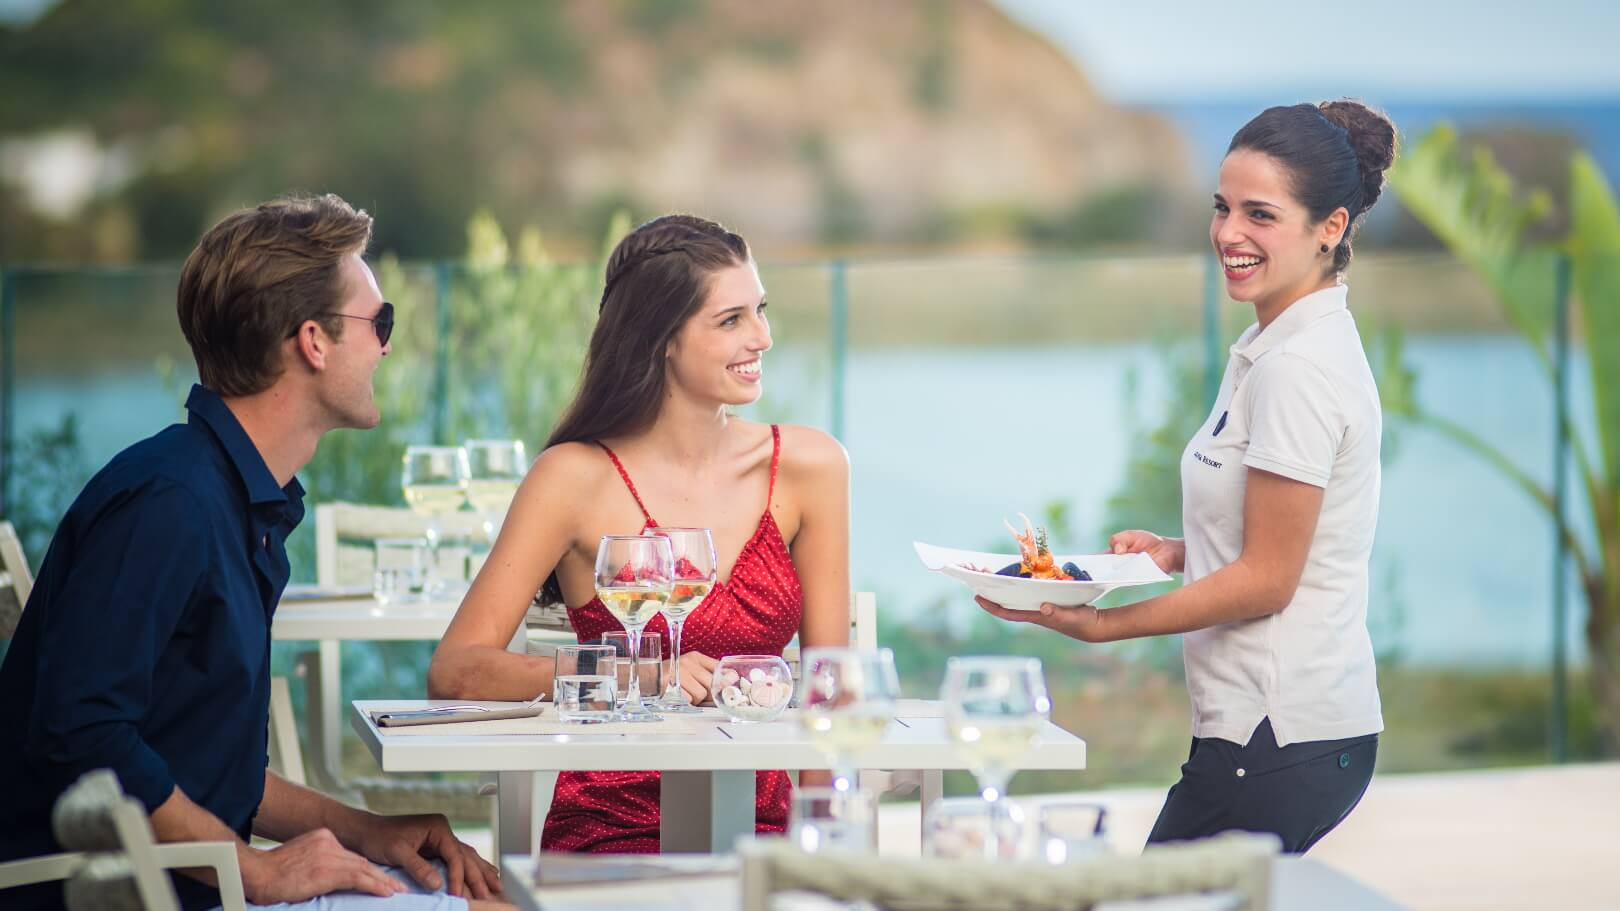 https://www.chialagunaresort.com/wp-content/uploads/2021/05/IHC_Chia-Laguna-Resort_grid_romantic_food.jpg